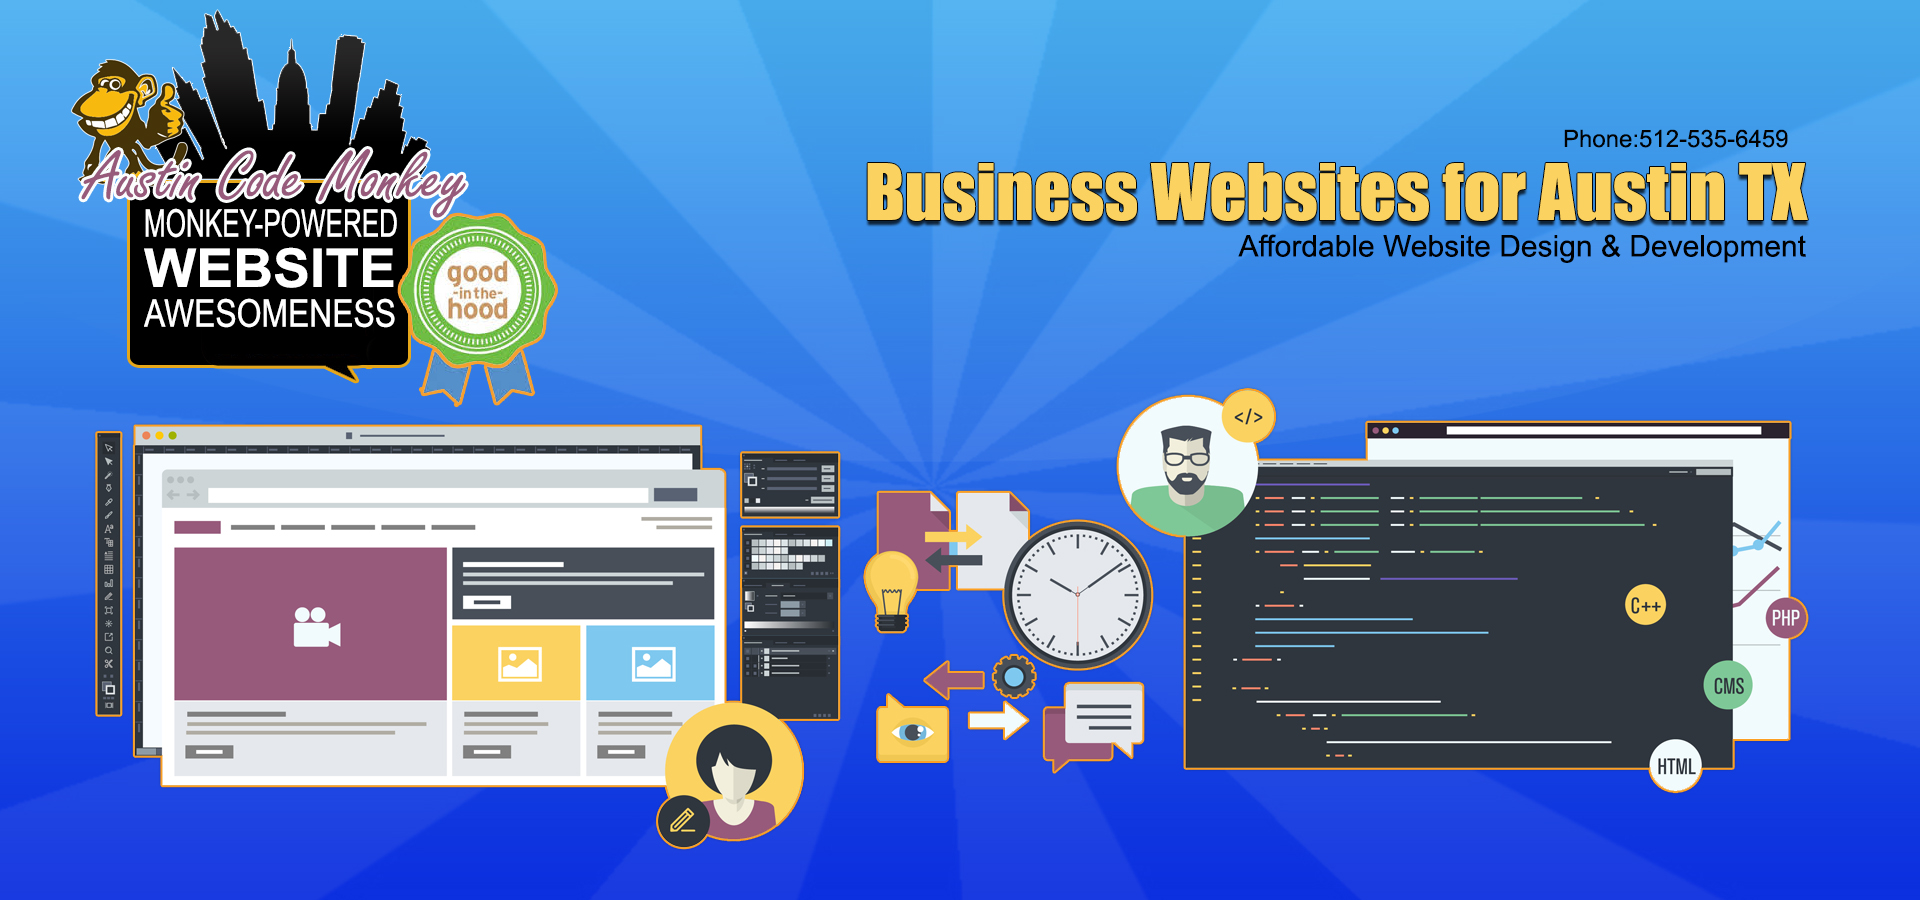 Austin SEO Social Media Marketing and Web Design